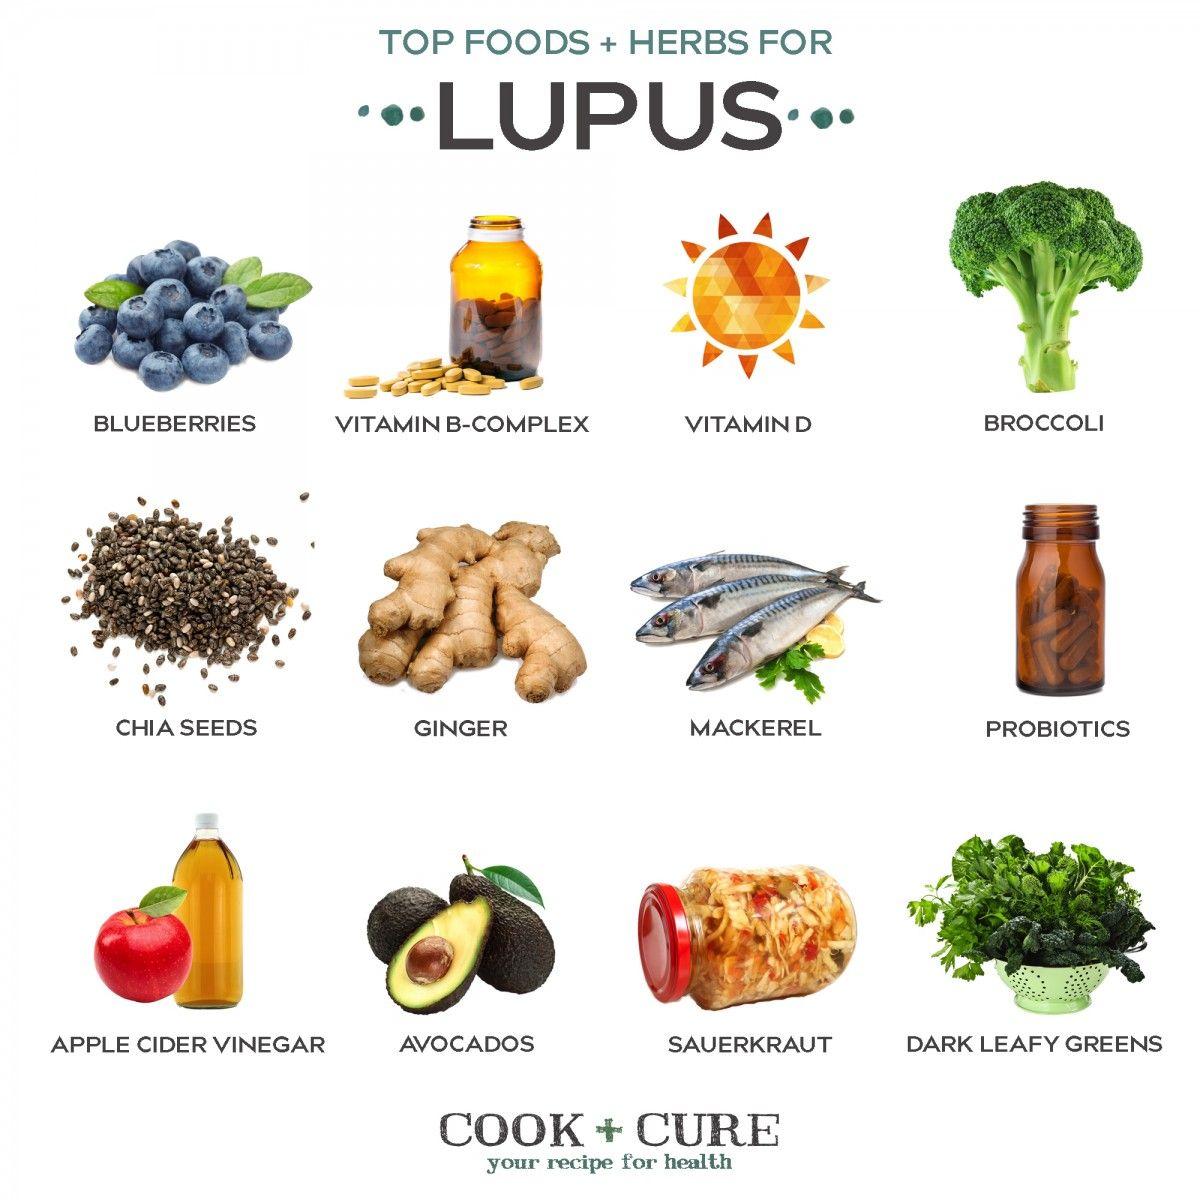 Top Foods Lupus Design 2 Healthy Gut Flora Lupus Diet Food For Digestion